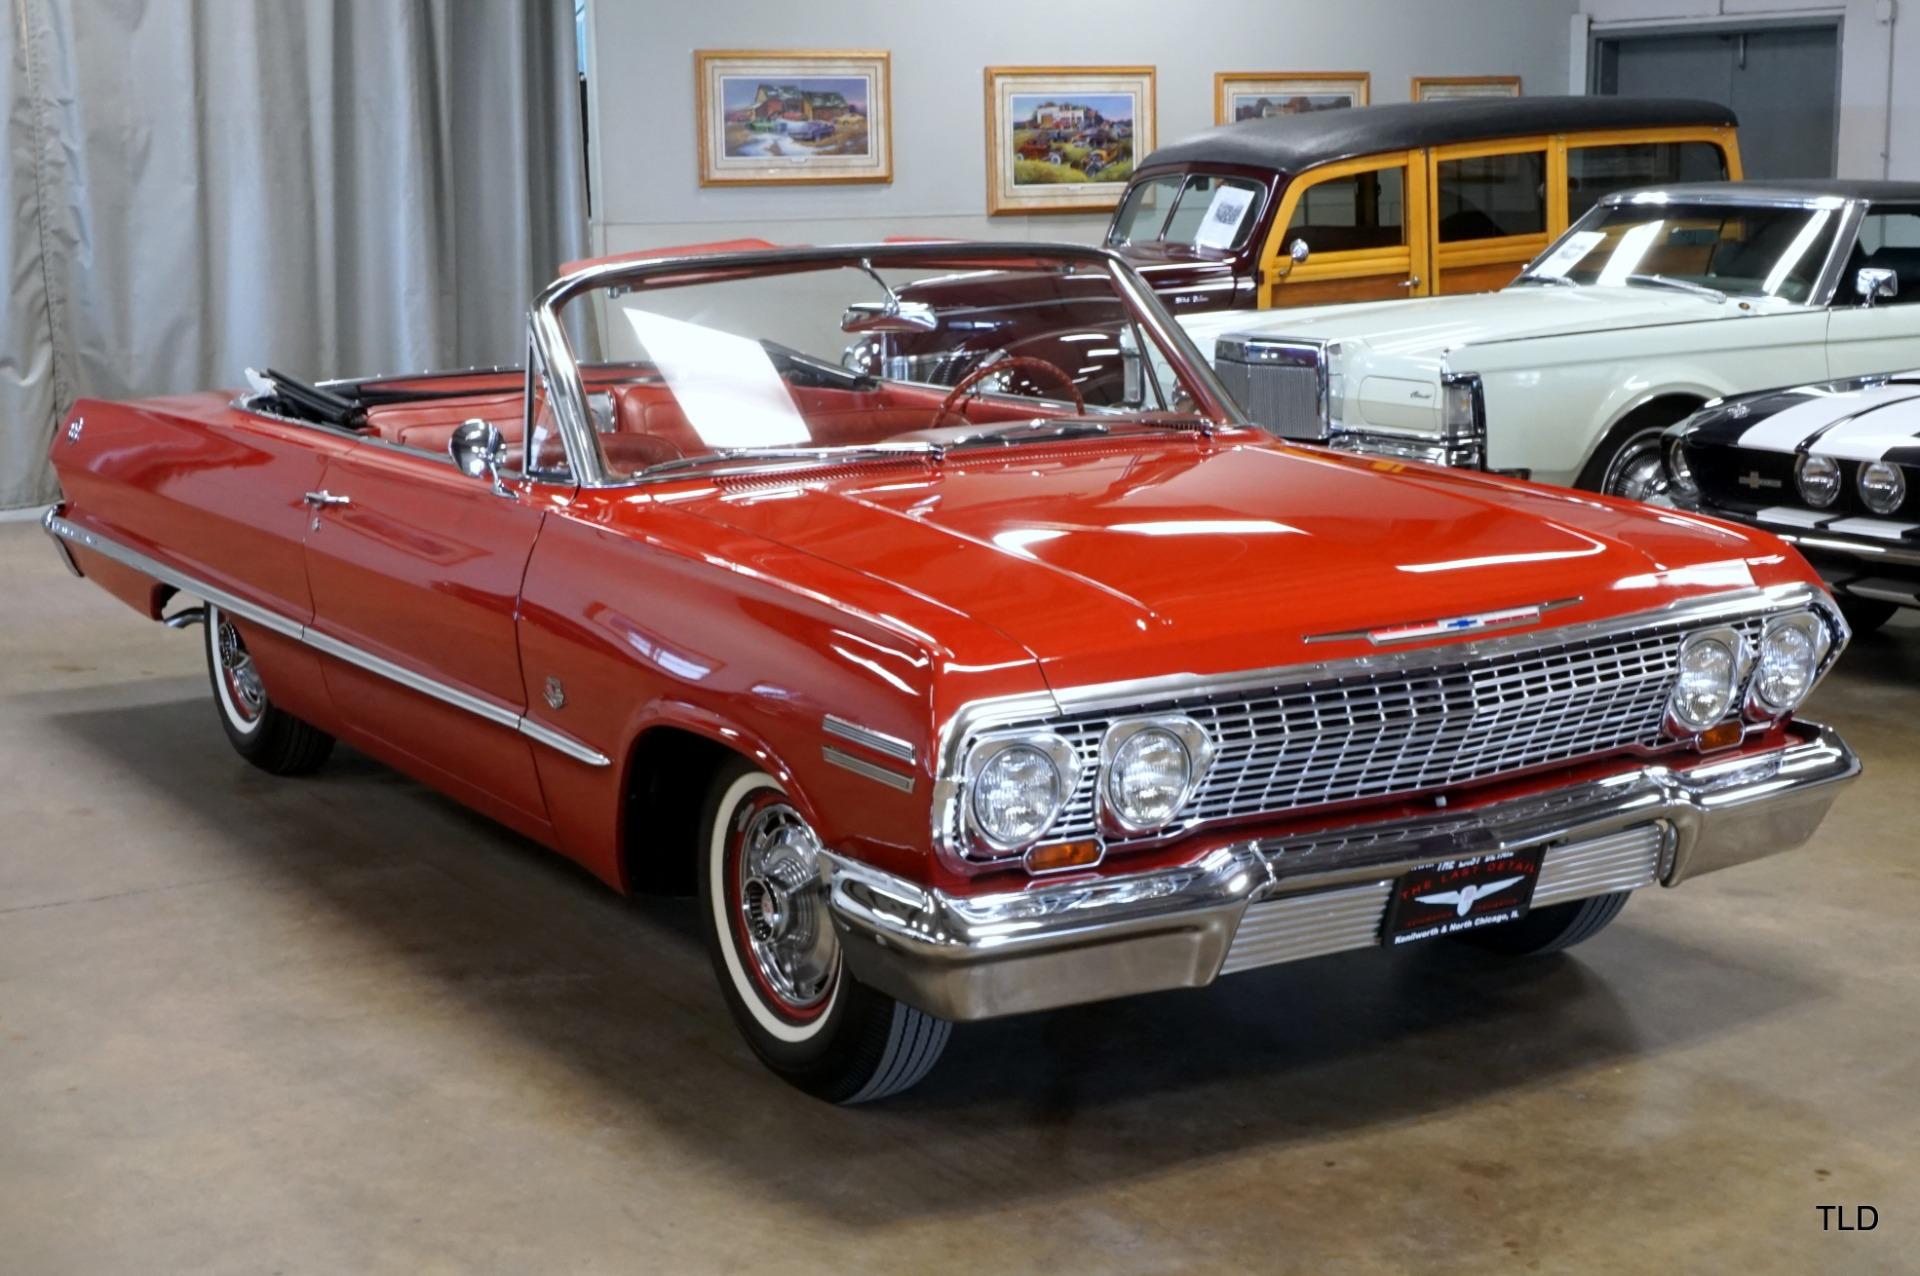 Details About 1963 Chevrolet Impala Ss 409